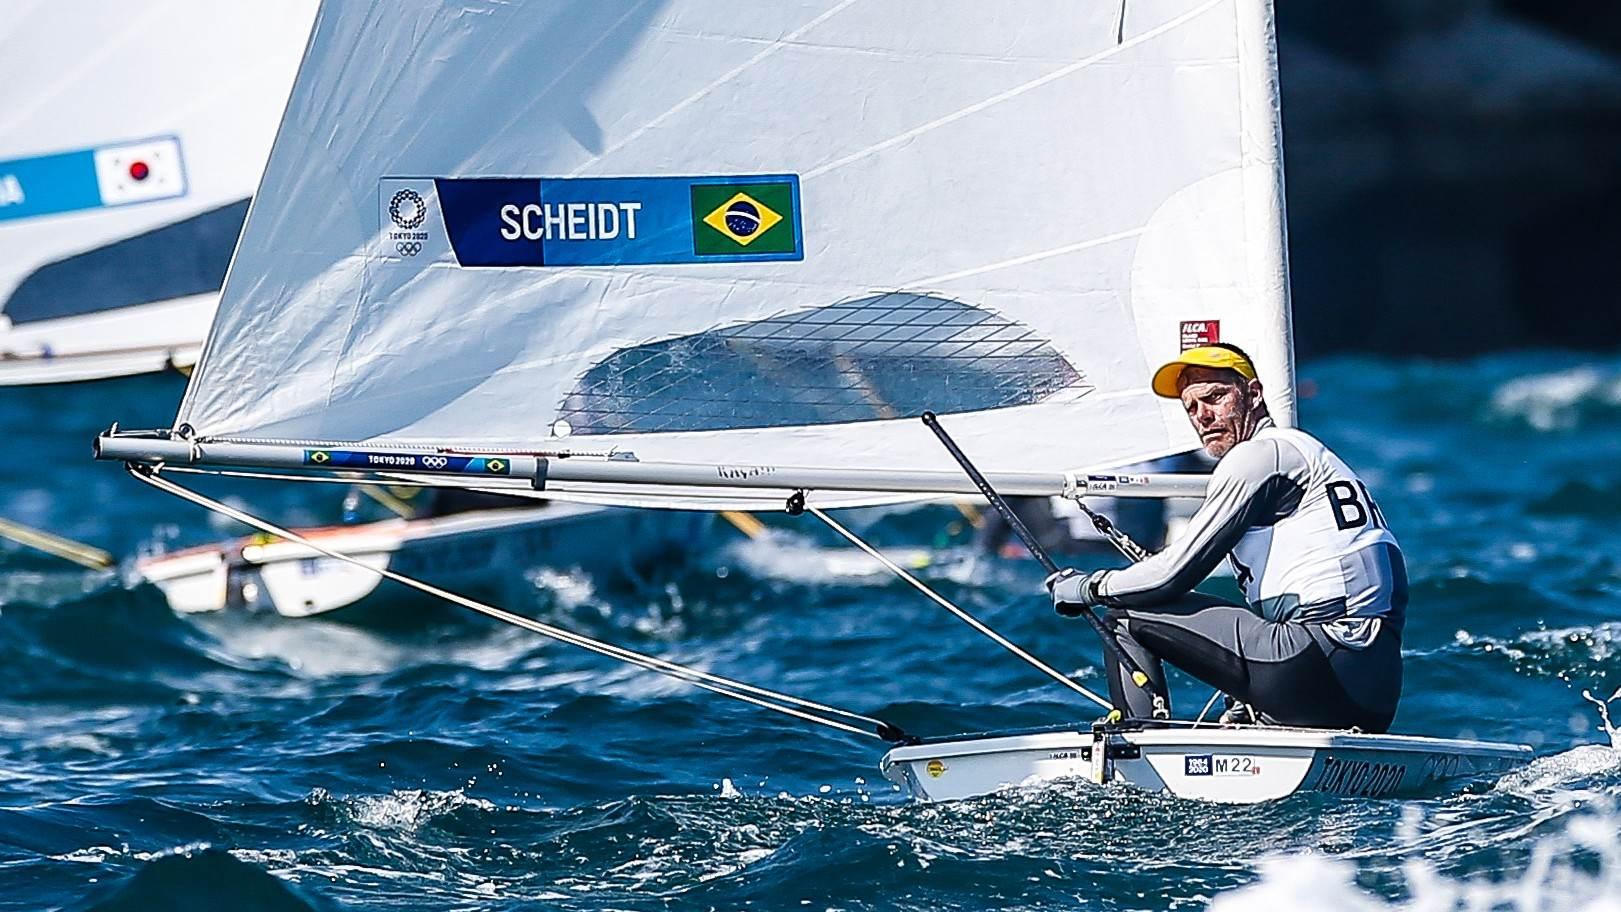 Robert Scheidt veleja durante regata das Olimpíadas de Tóquio